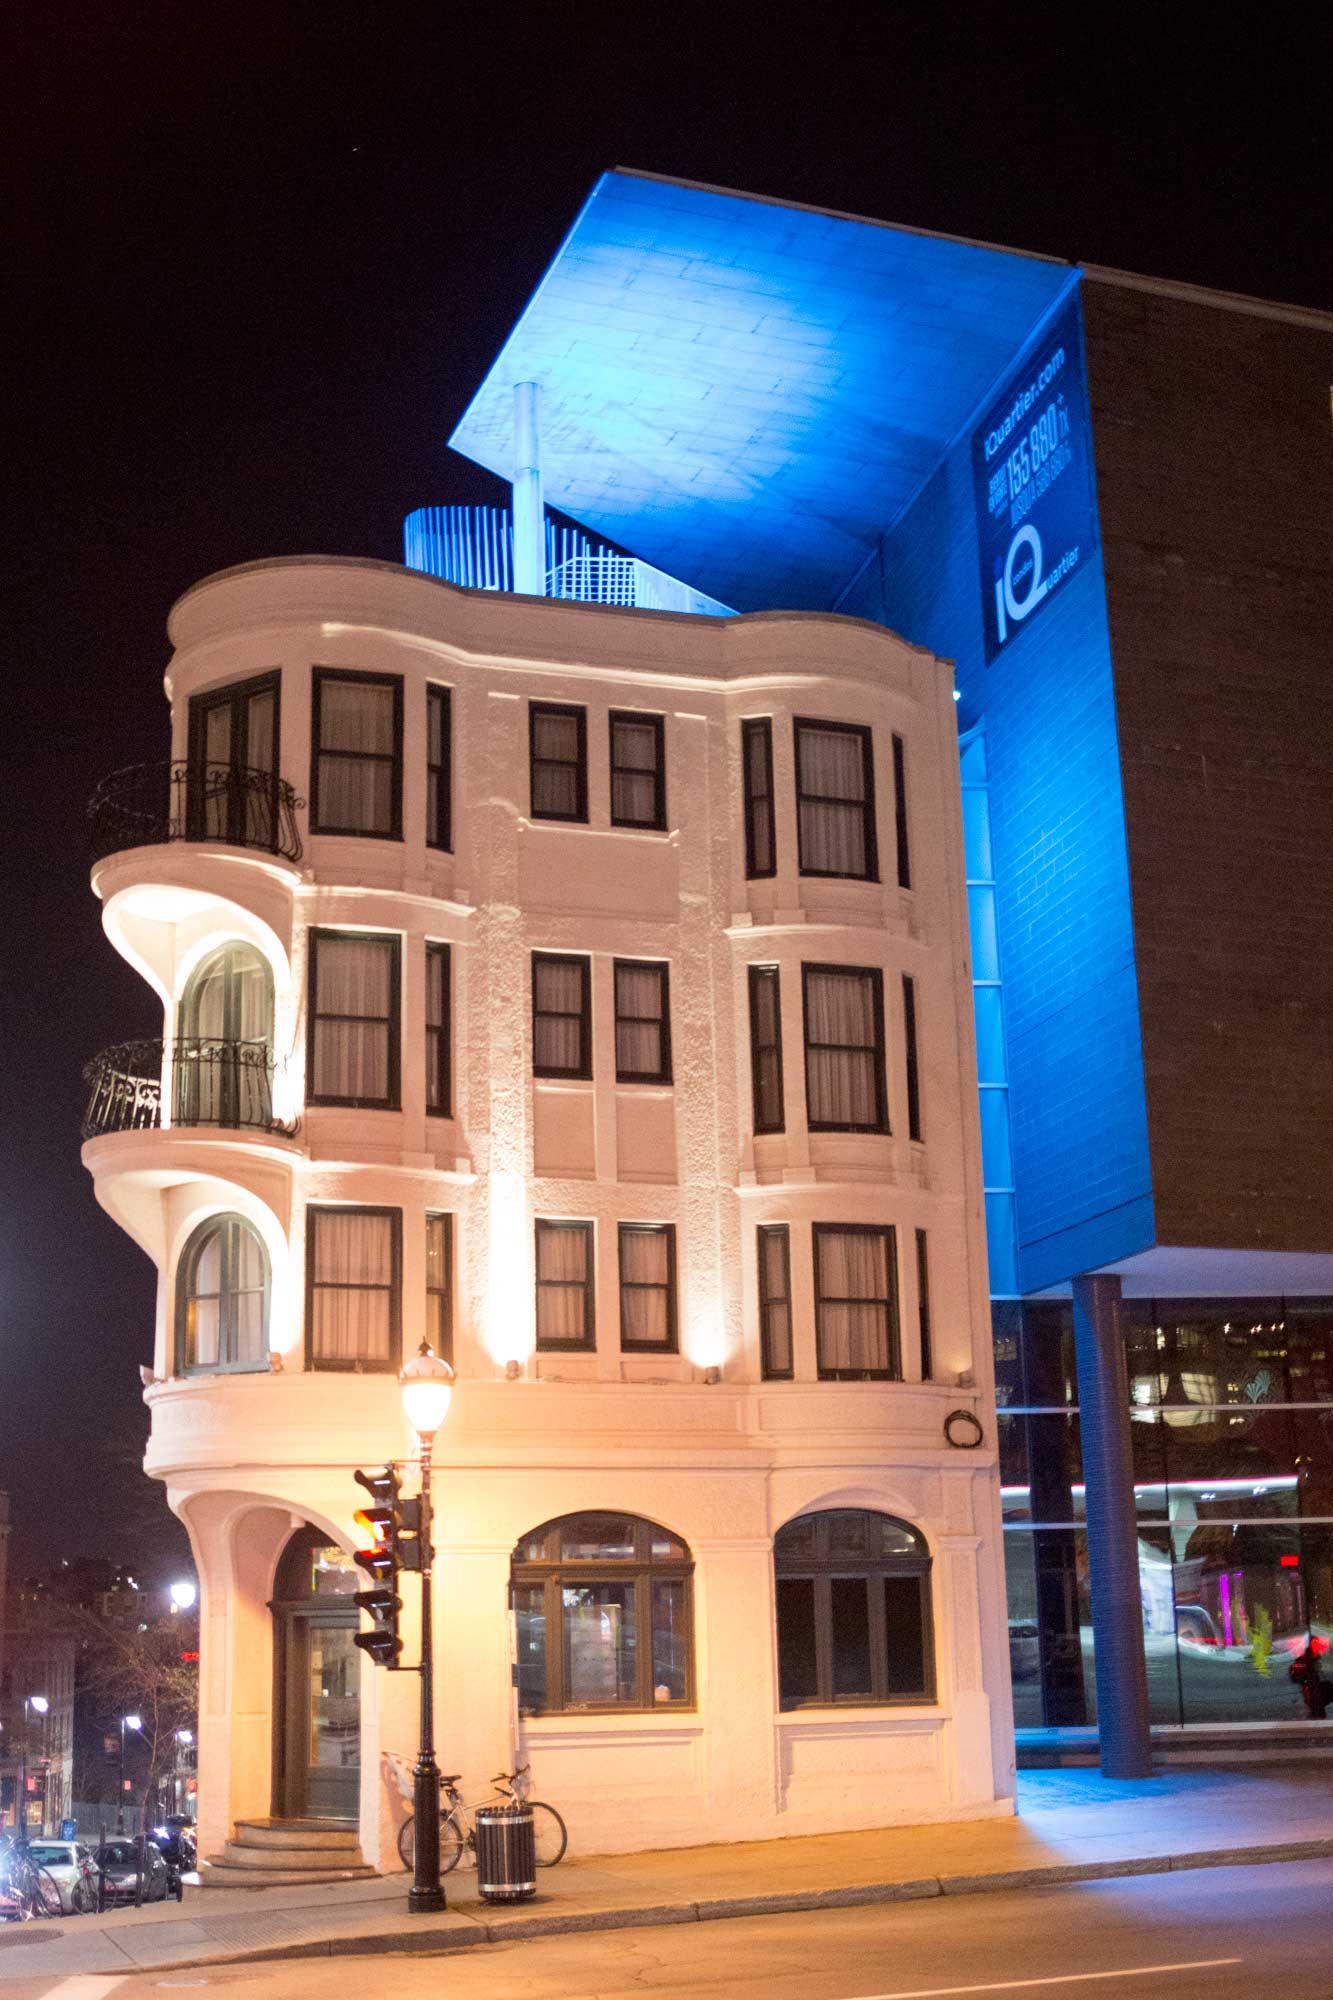 Hotel-10-Montreal-Stenberg-0341.jpg